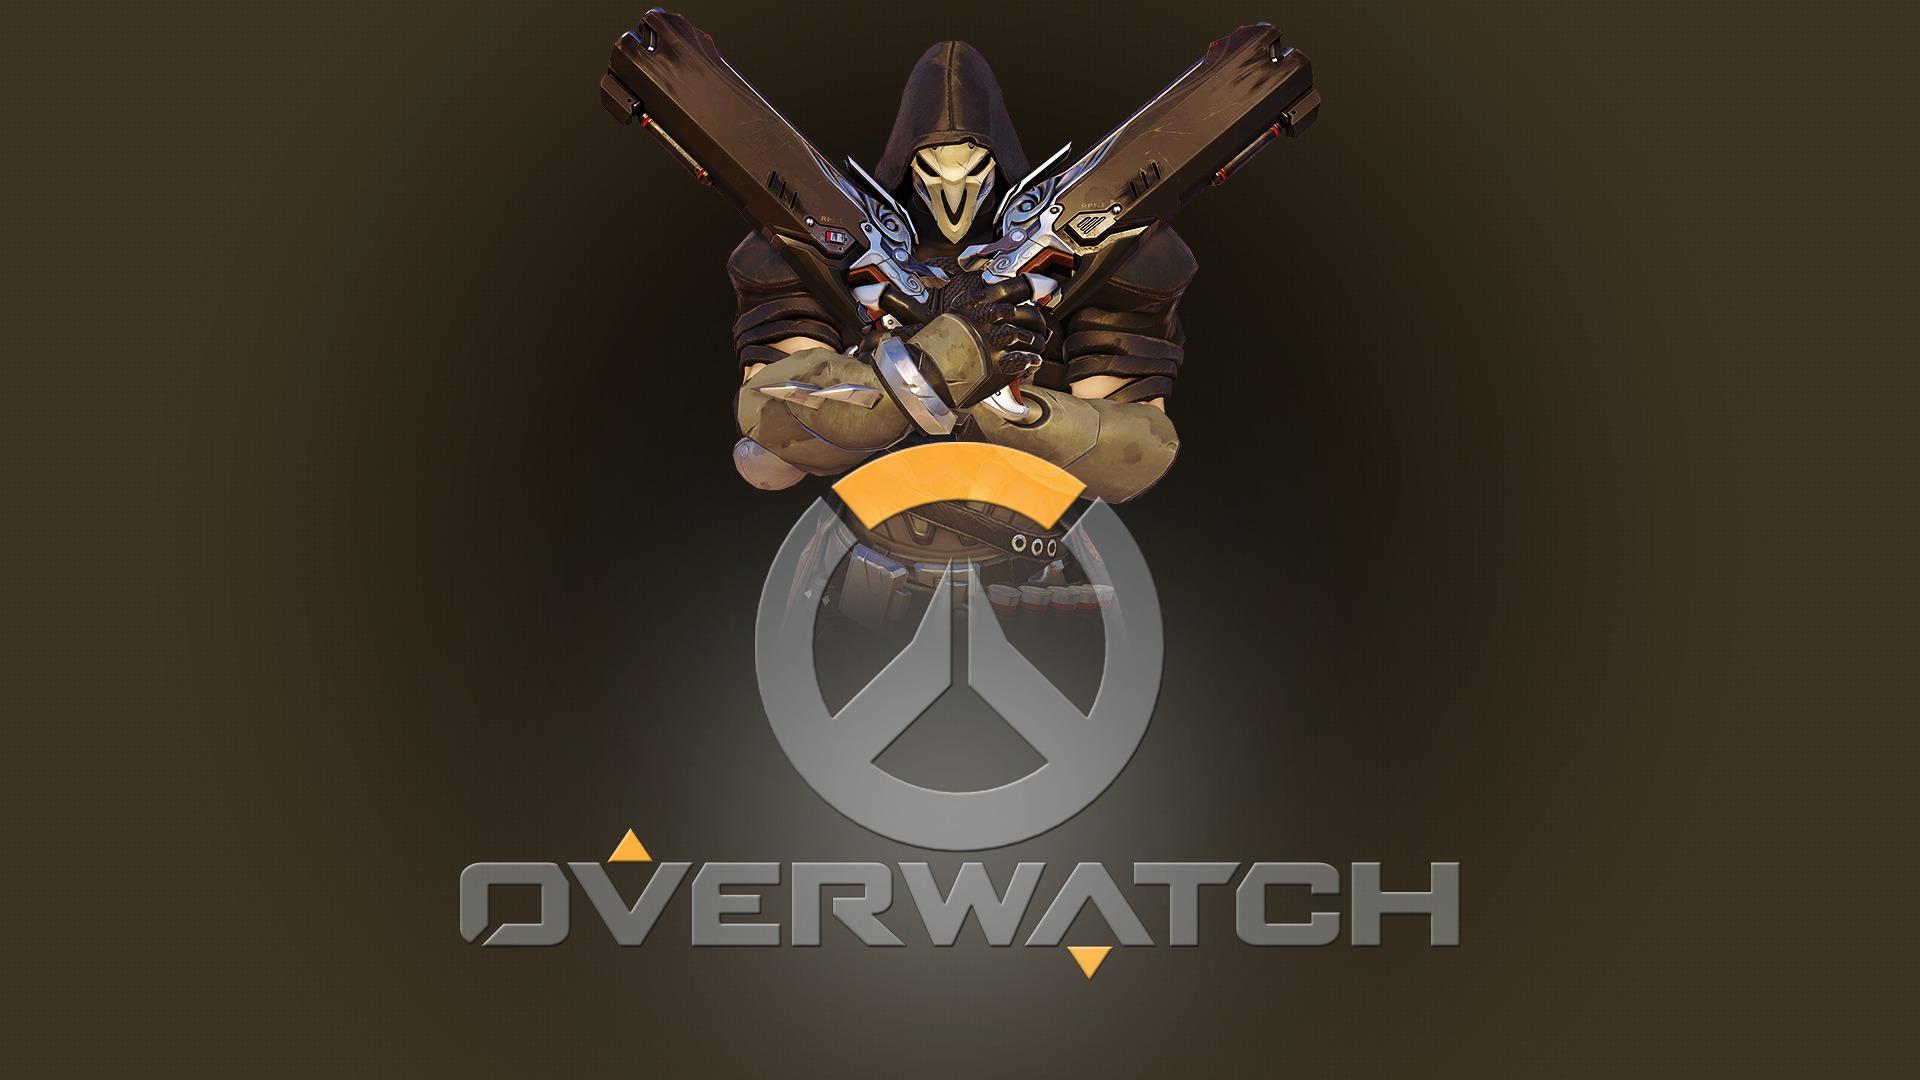 Overwatch: Blizzard Entertainment, Reaper